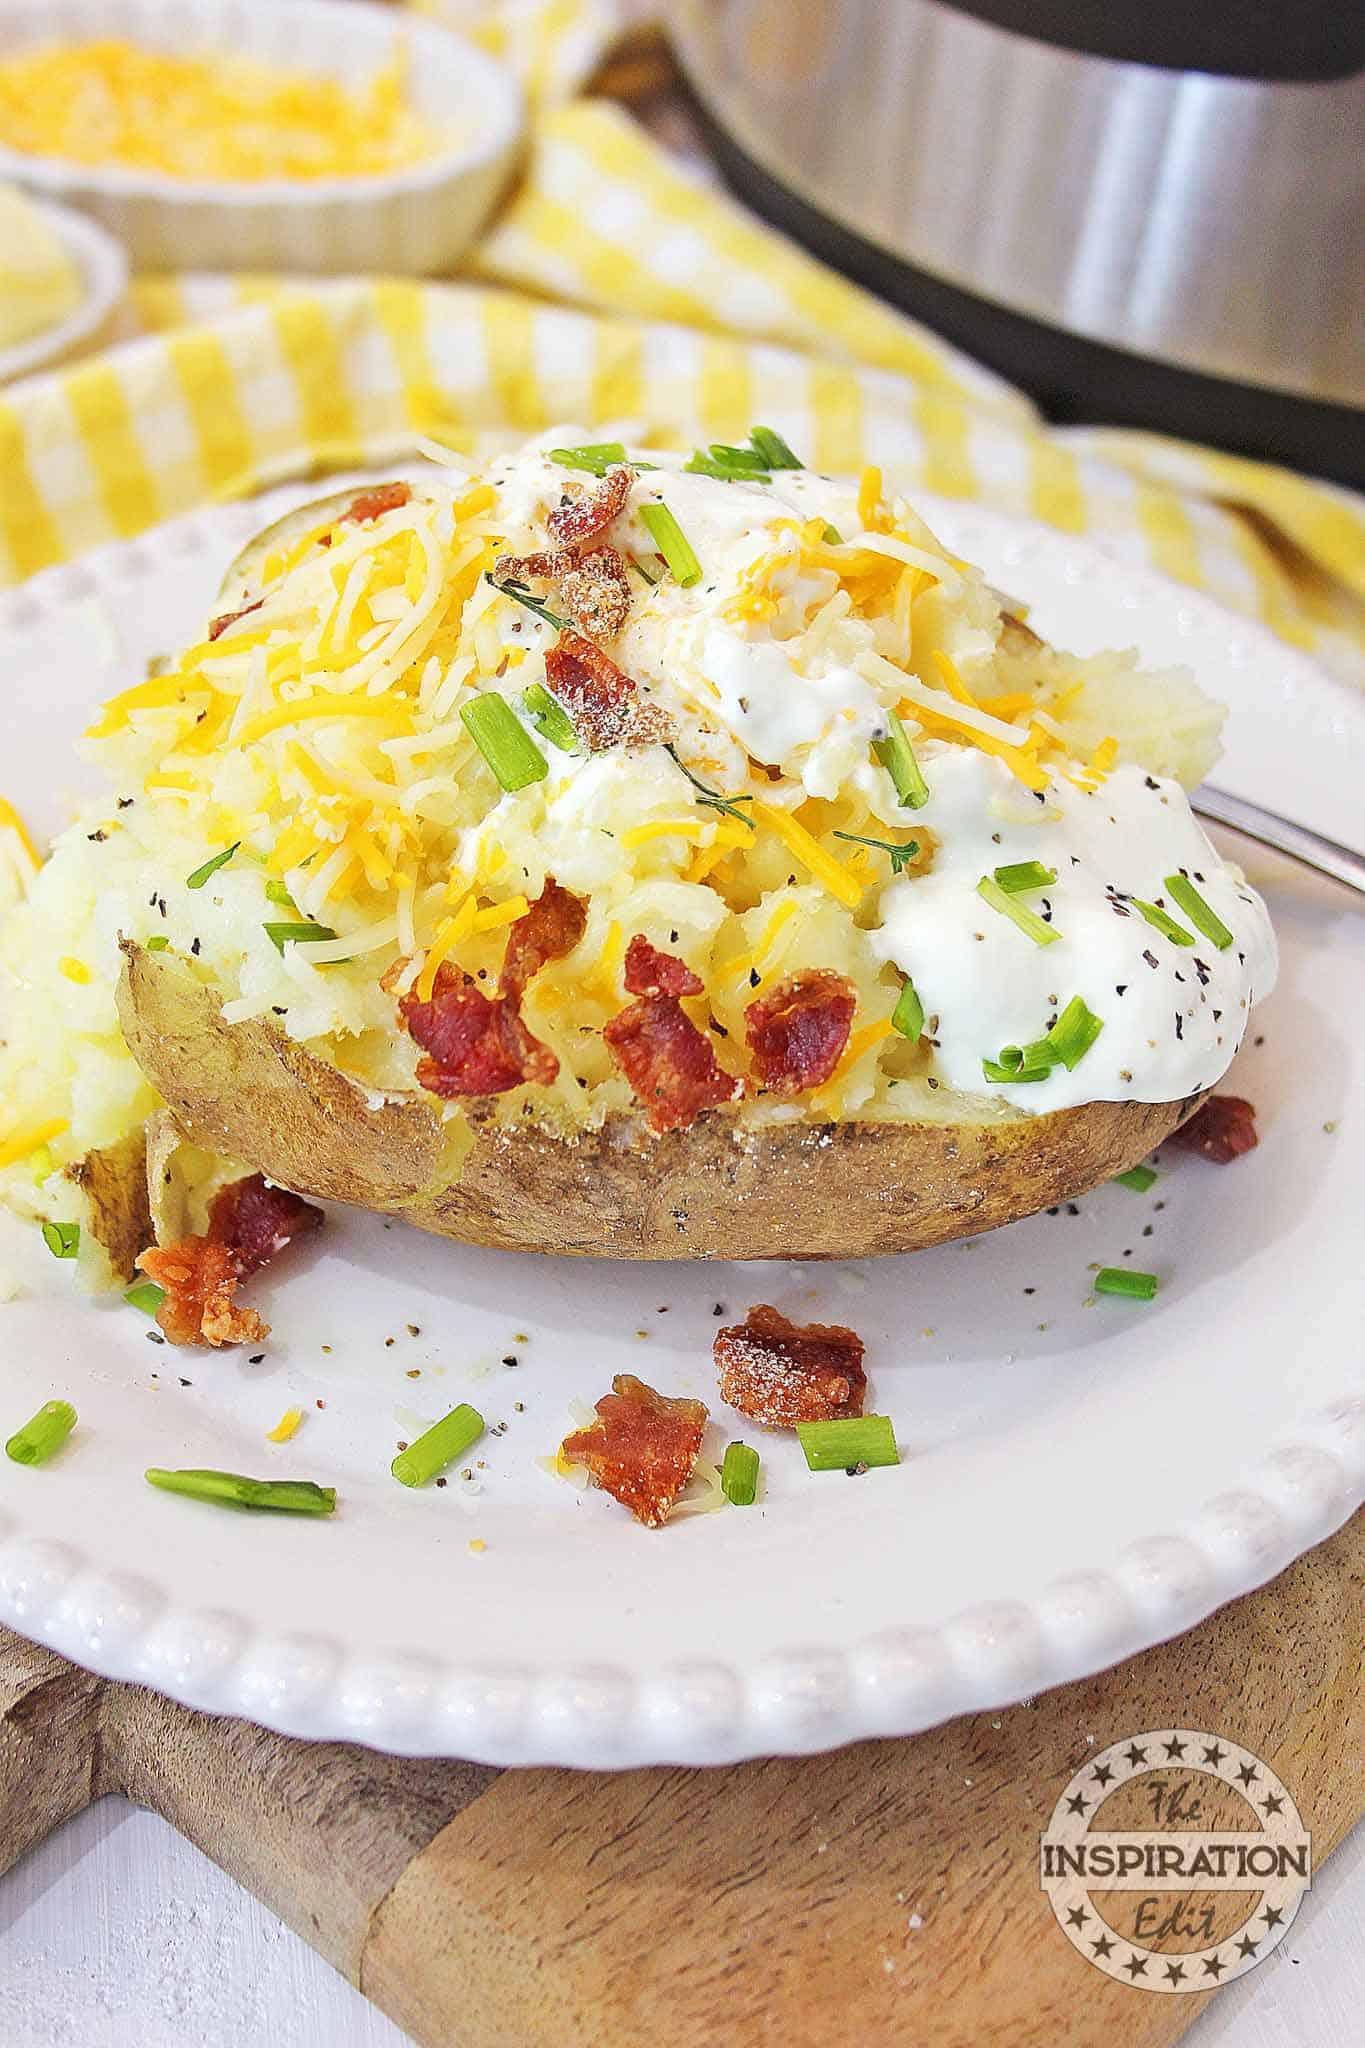 instant pot loaded baked potato